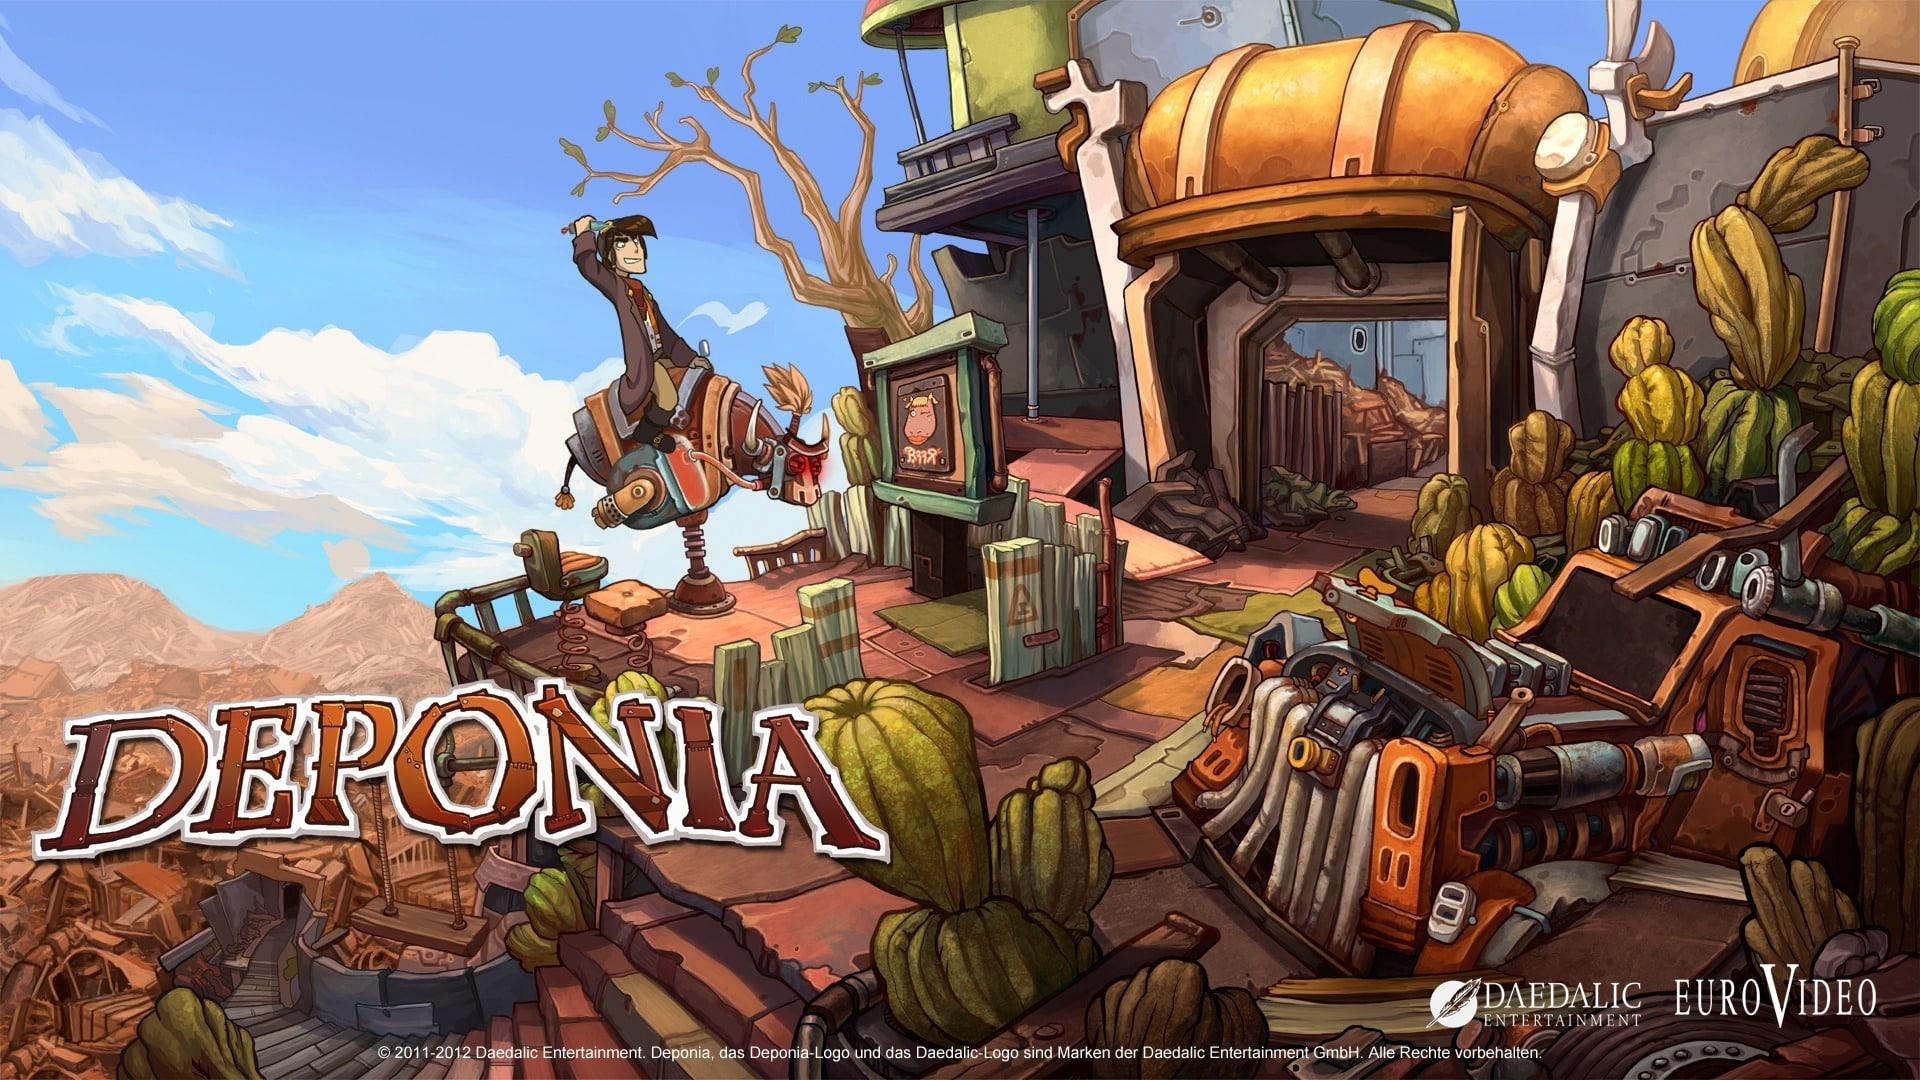 Deponia free game indiegala Daedalic Entertainment